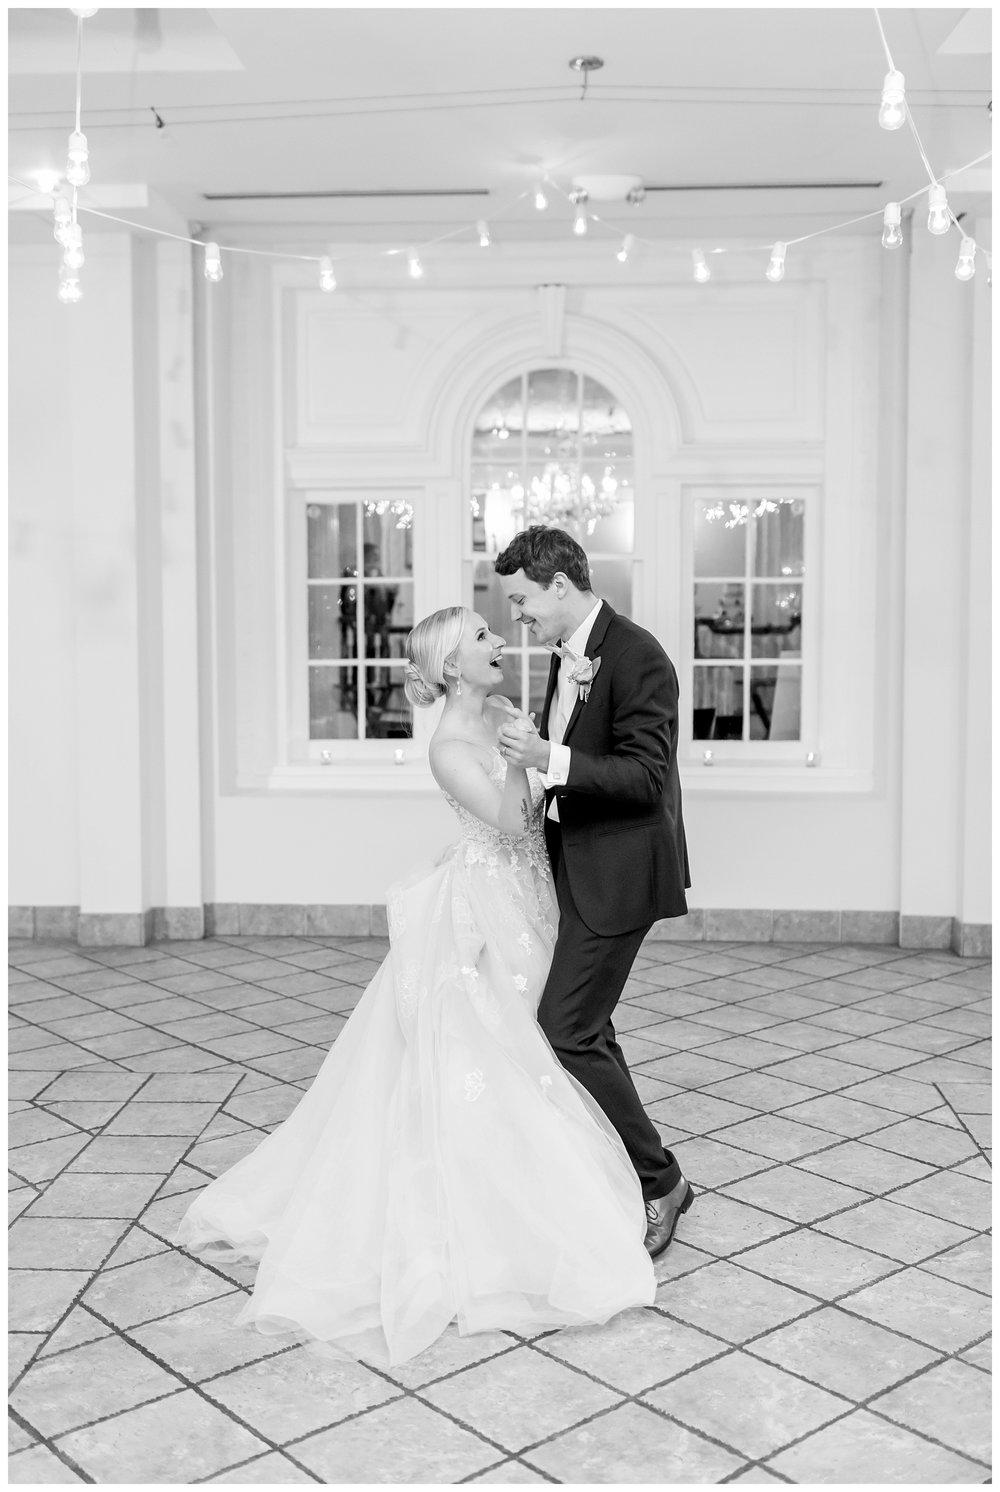 Whitehall Estate Wedding | Northern Virginia Wedding Photographer Kir Tuben_0106.jpg